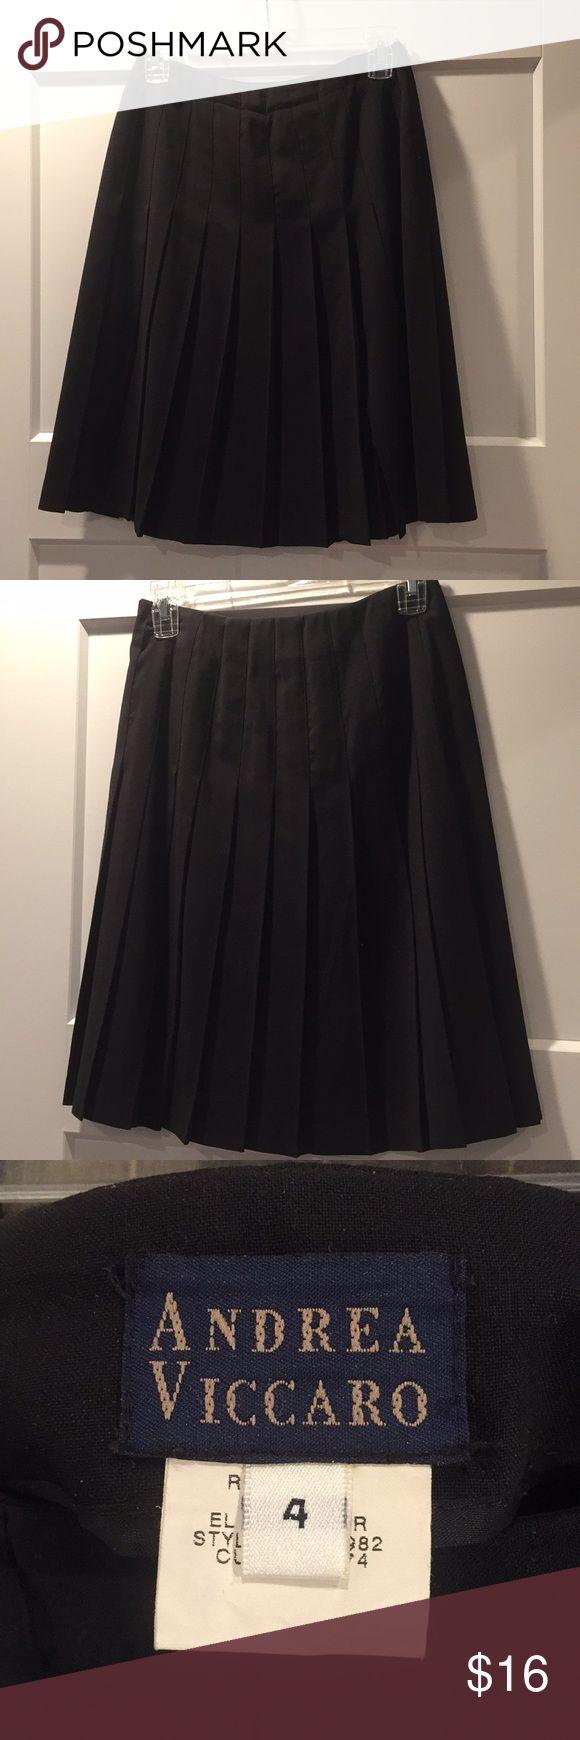 Pleated Skirt (Andrea Viccaro) Black, knee-length, pleated skirt. Andrea Viccaro design. Size 4. No stains, like new condition. Skirts